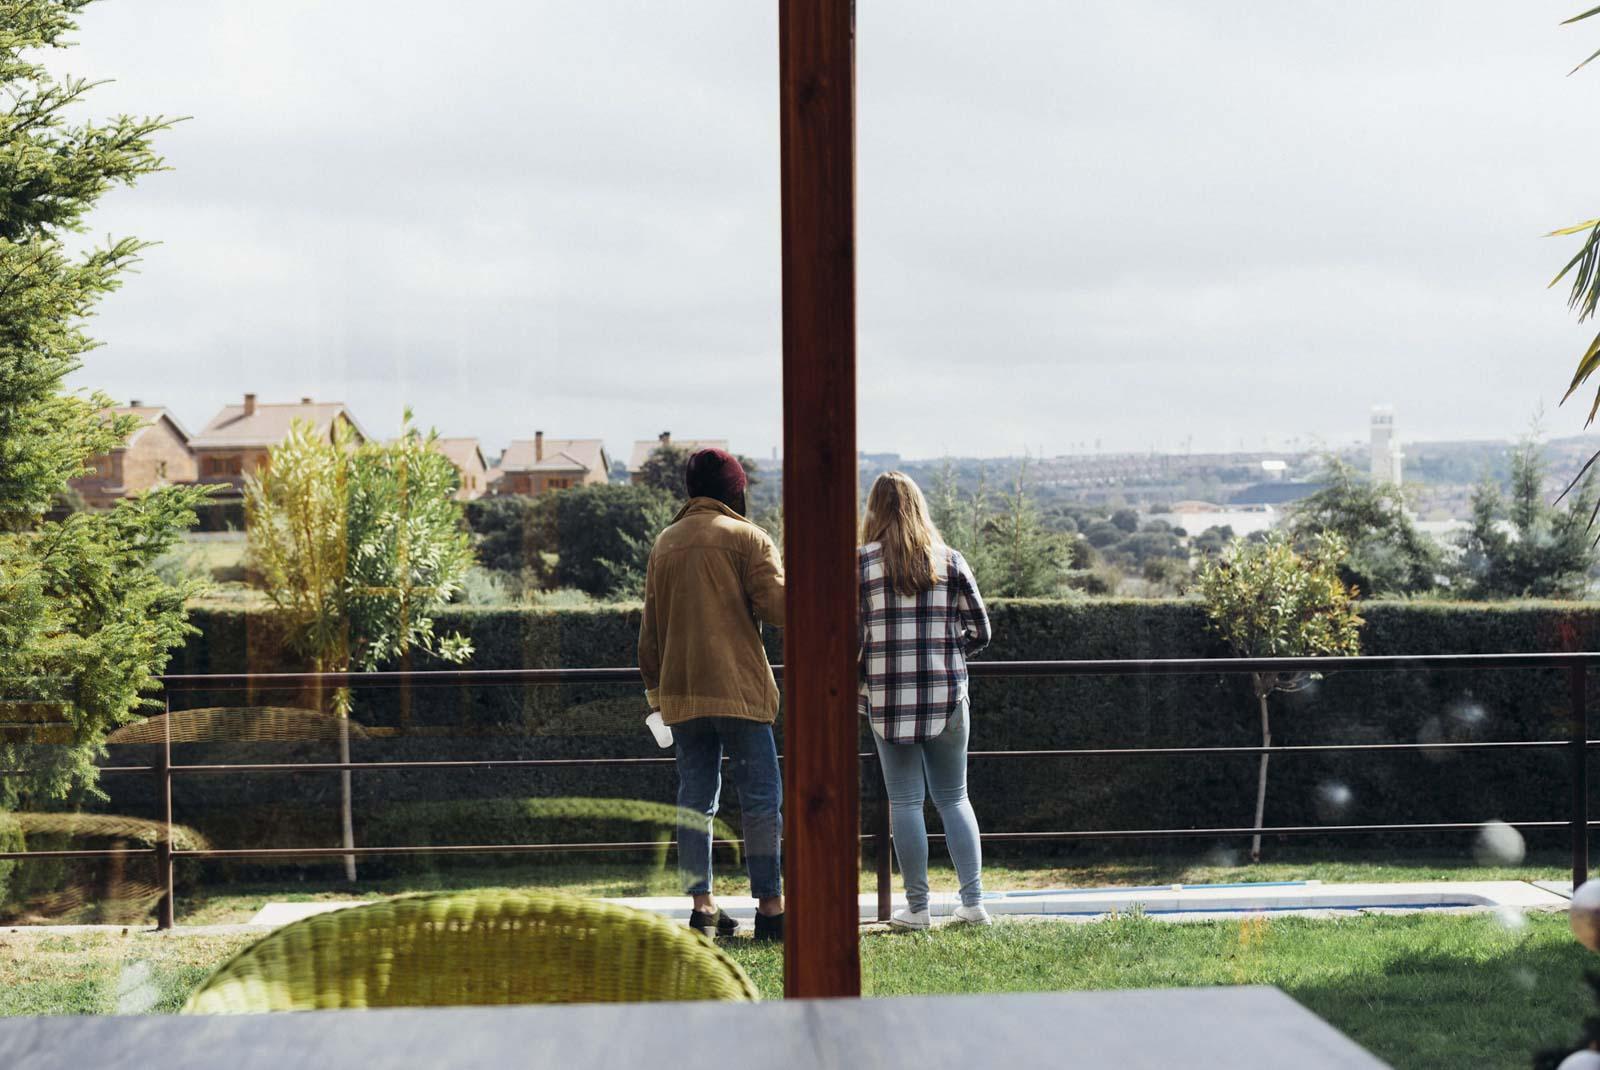 La caja: Short Film – Behind the scenes